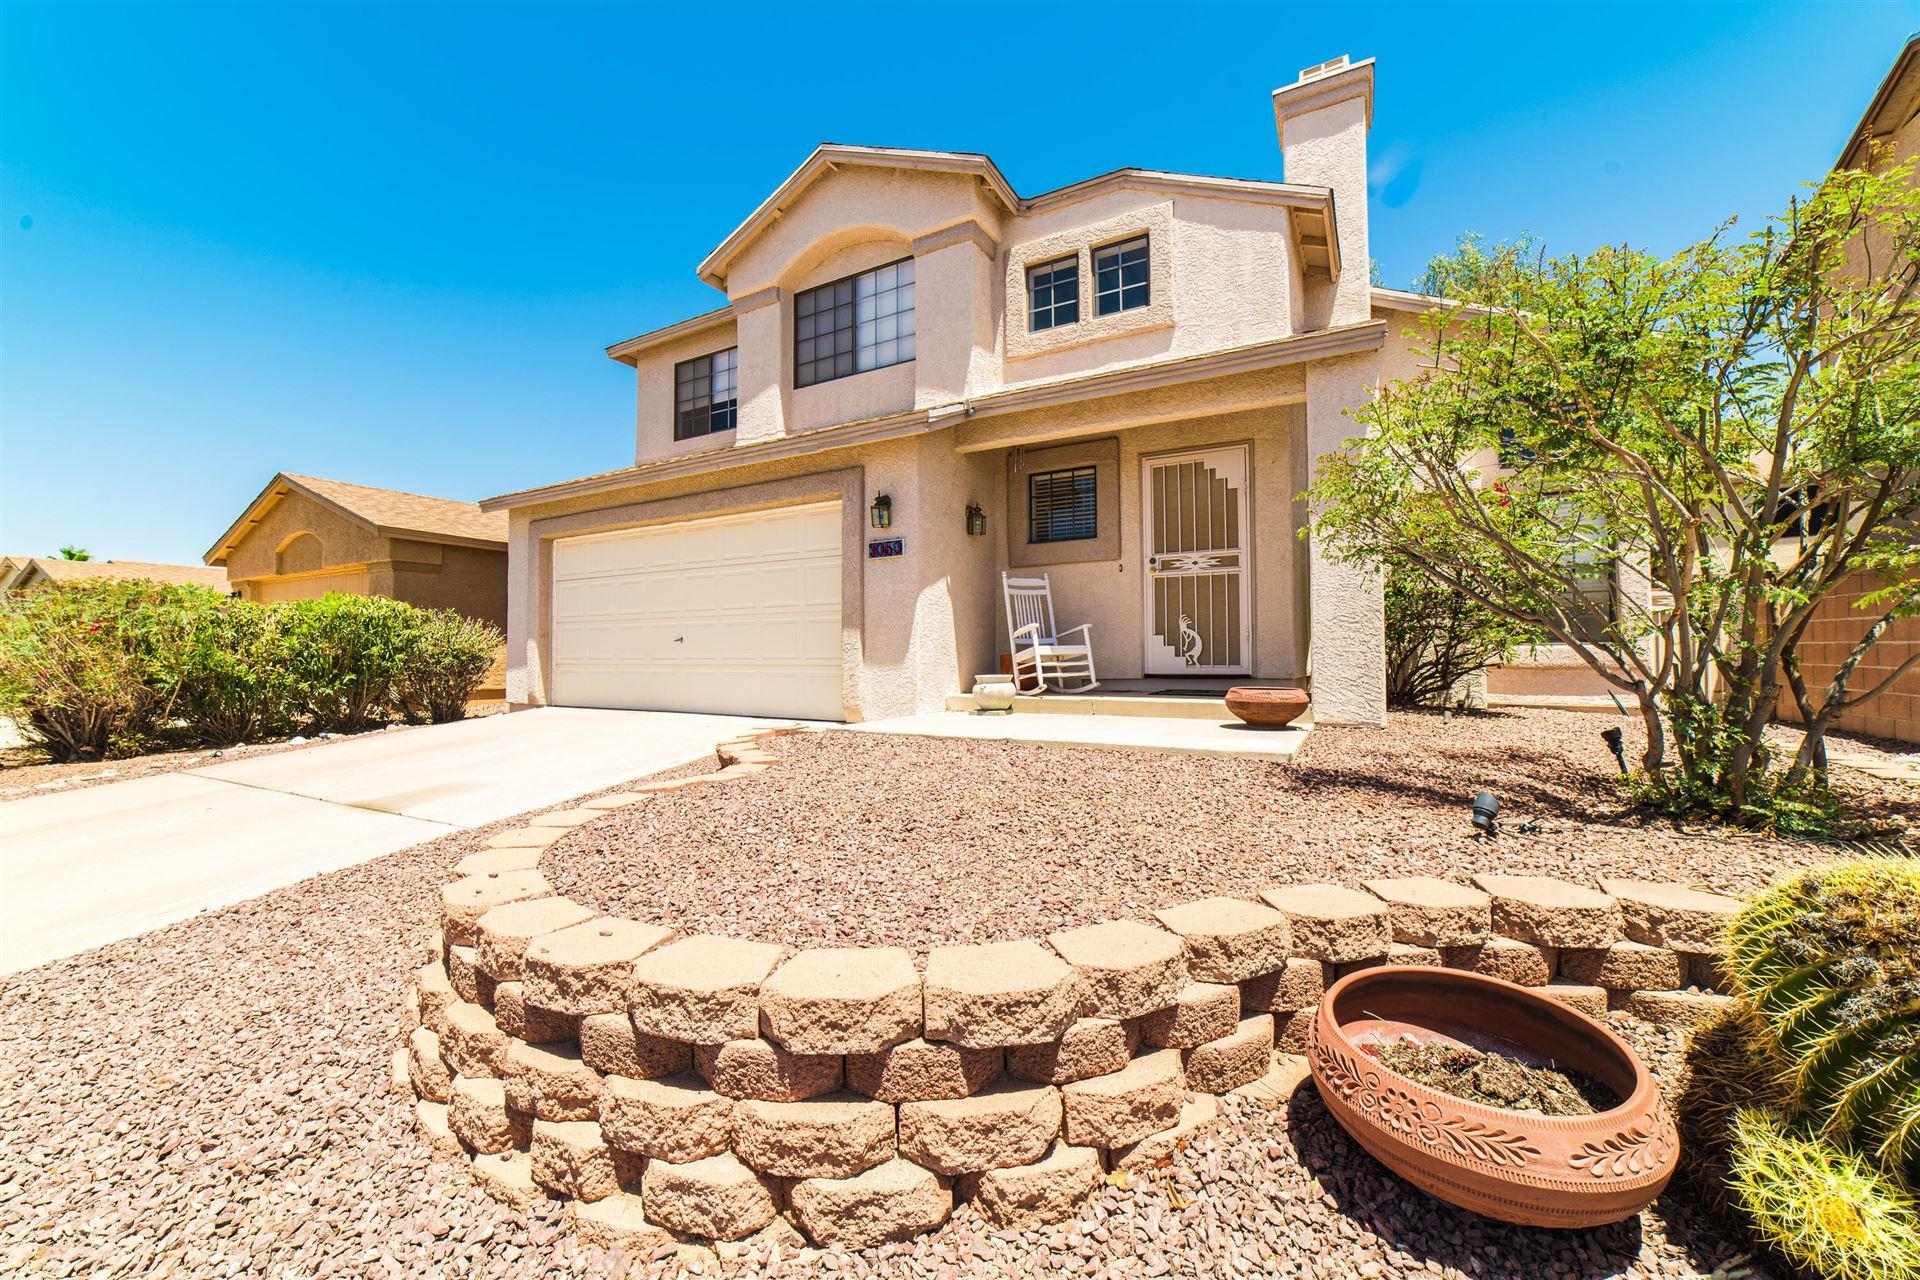 3050 W Country Meadow Drive, Tucson, AZ 85742 - MLS#: 22112044